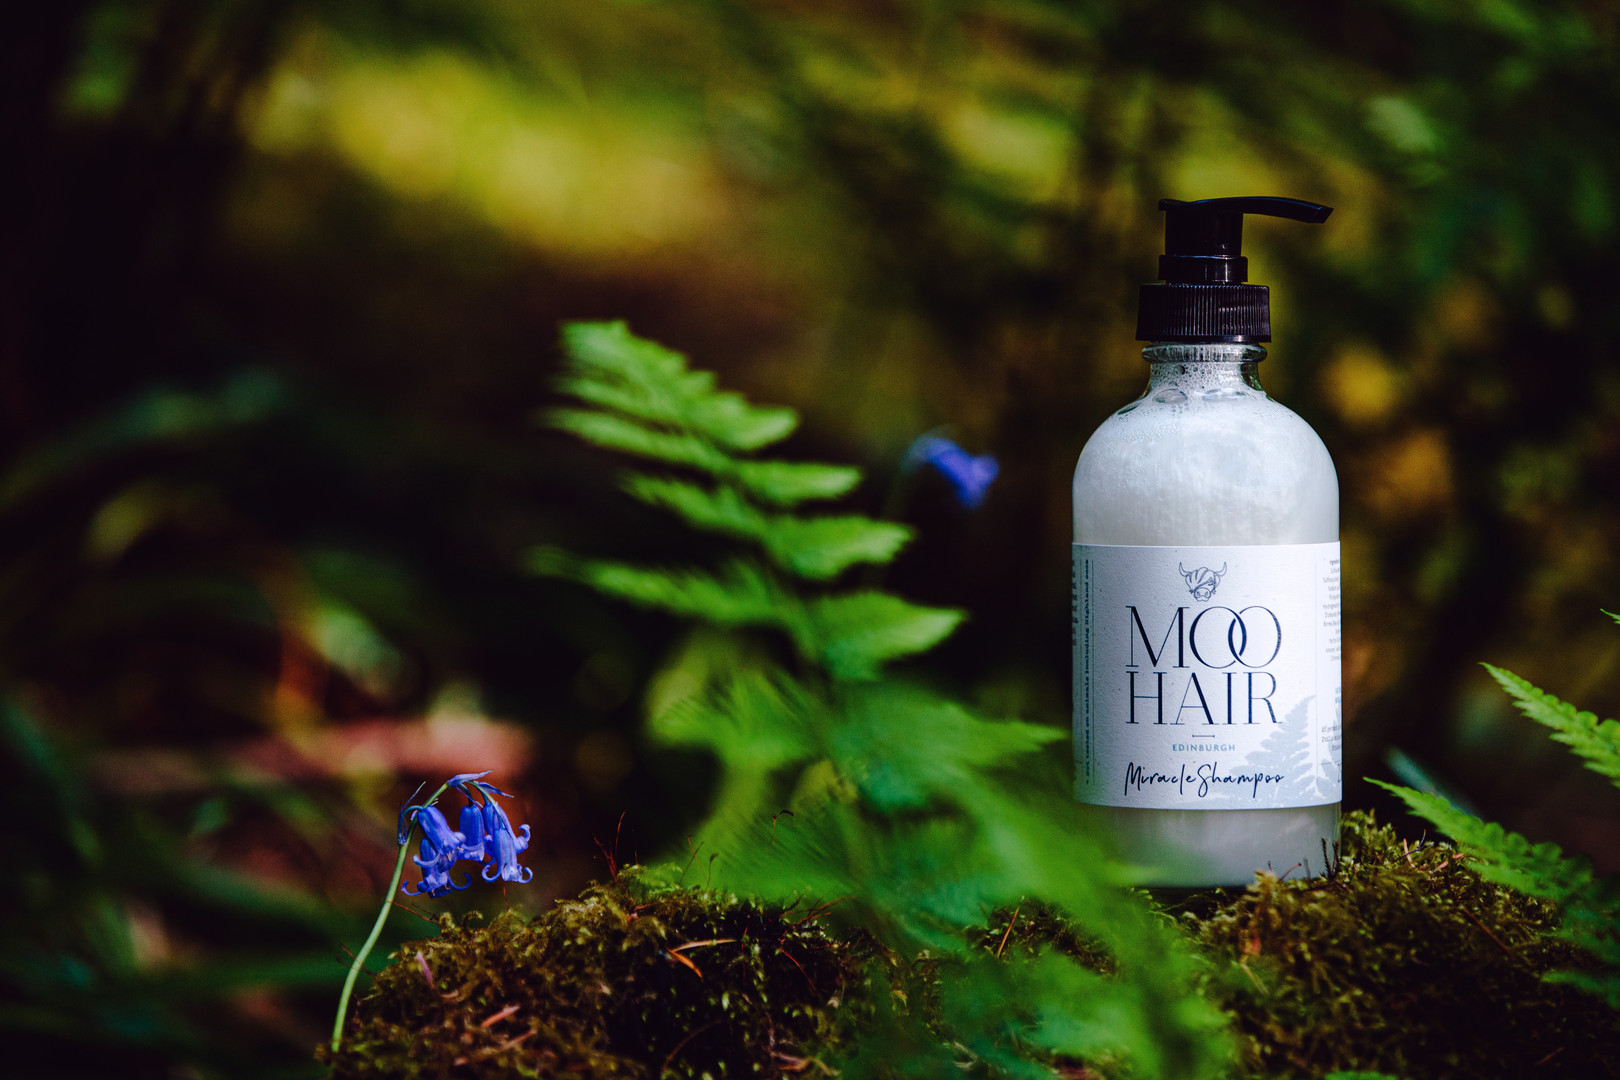 Moo Hair Set 10 Miracle shampoo2.jpg